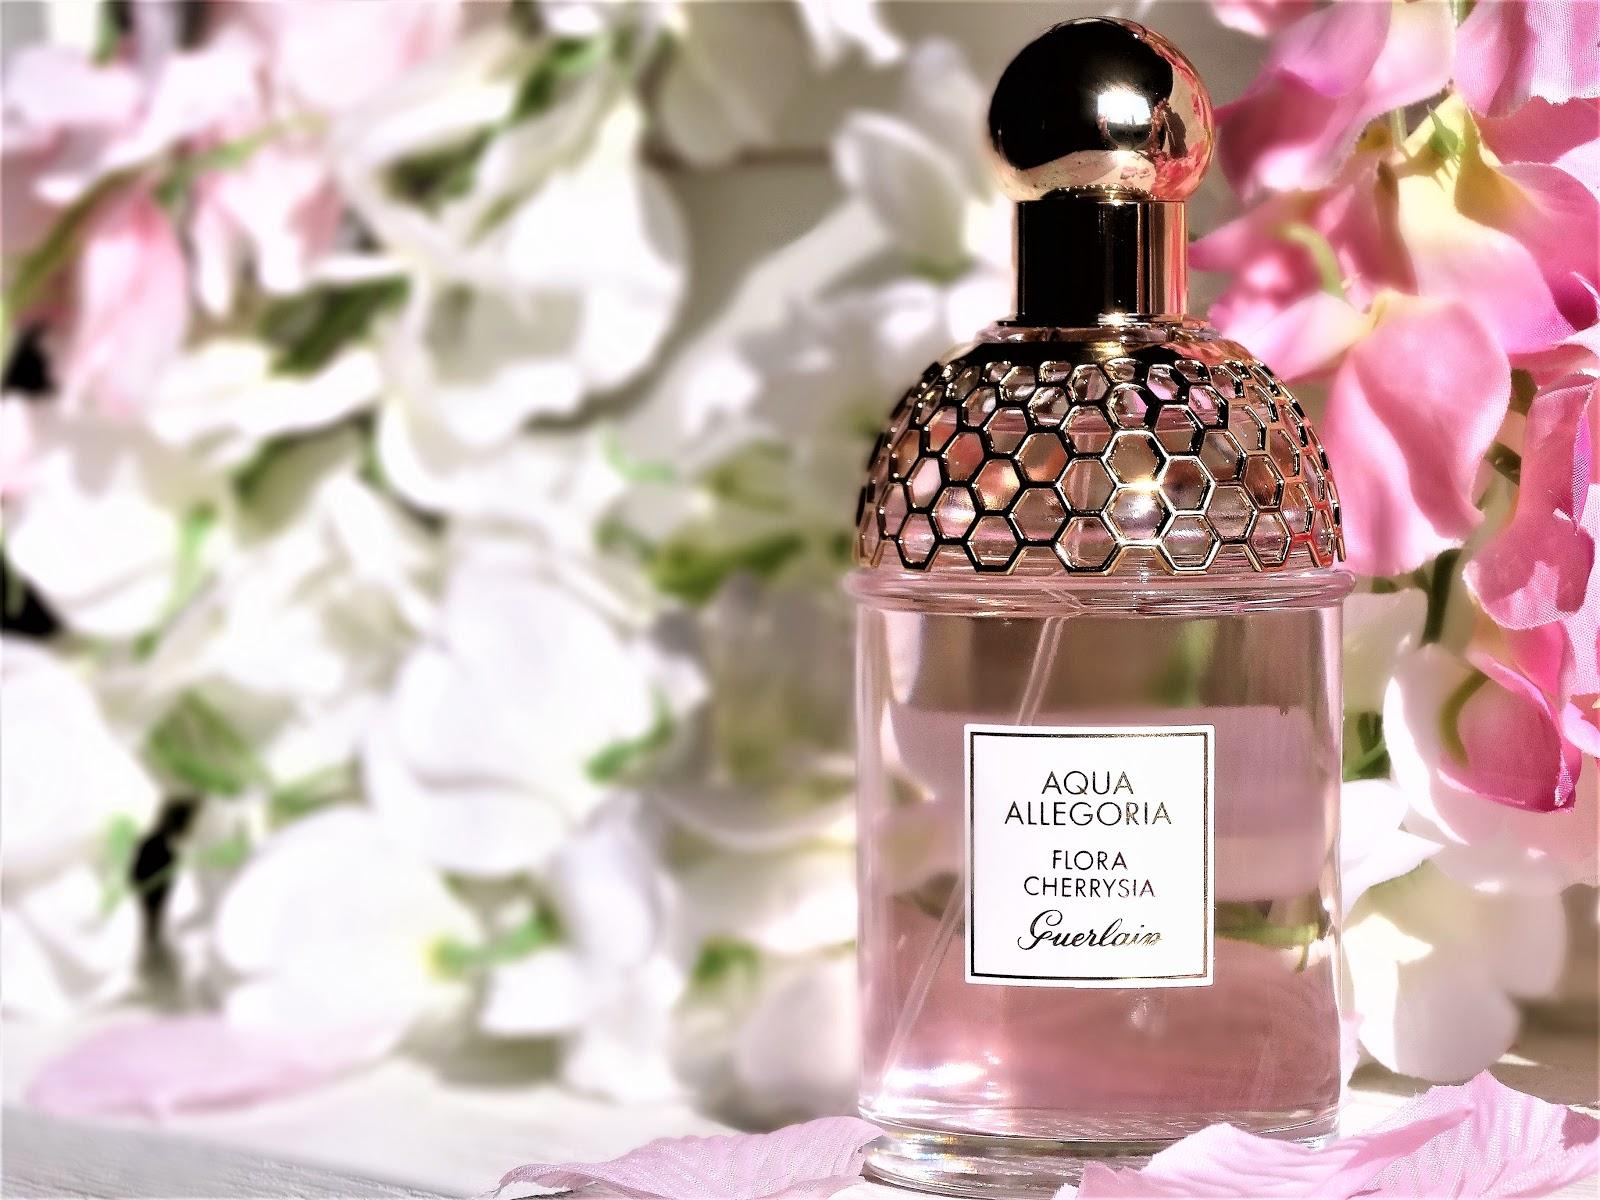 Le Nouveau Cherrysia Flora Allegoria Parfum Guerlain Aqua u1J3FcTlK